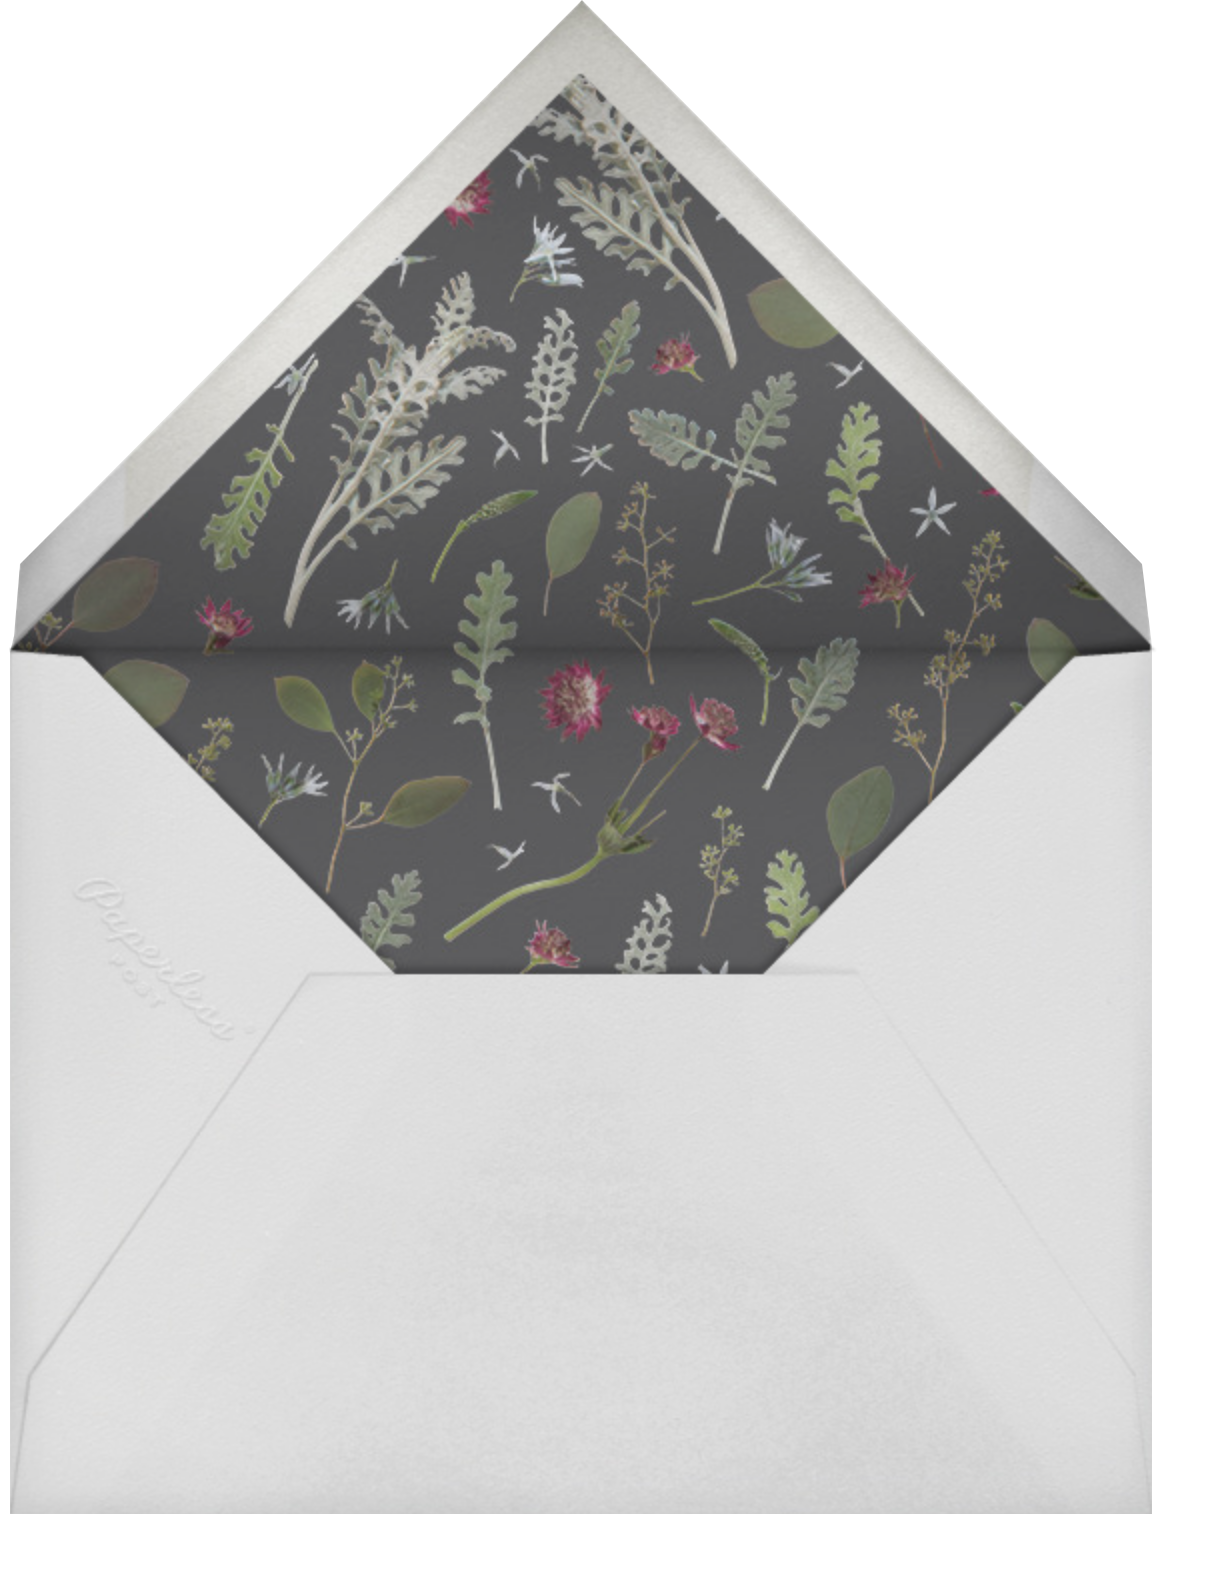 Winter Wilds - Paperless Post - Memorial service - envelope back